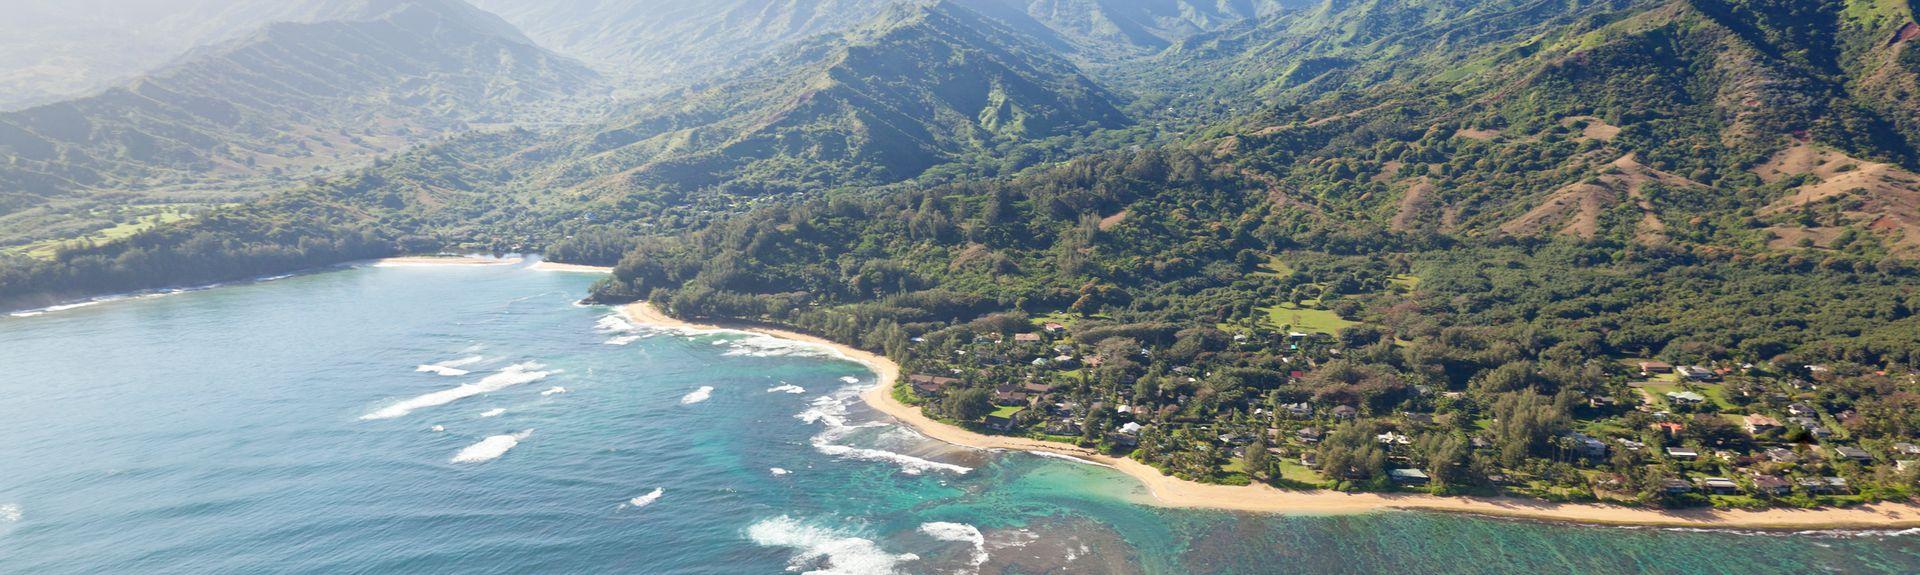 Haena, Hanalei, Hawaï, États-Unis d'Amérique